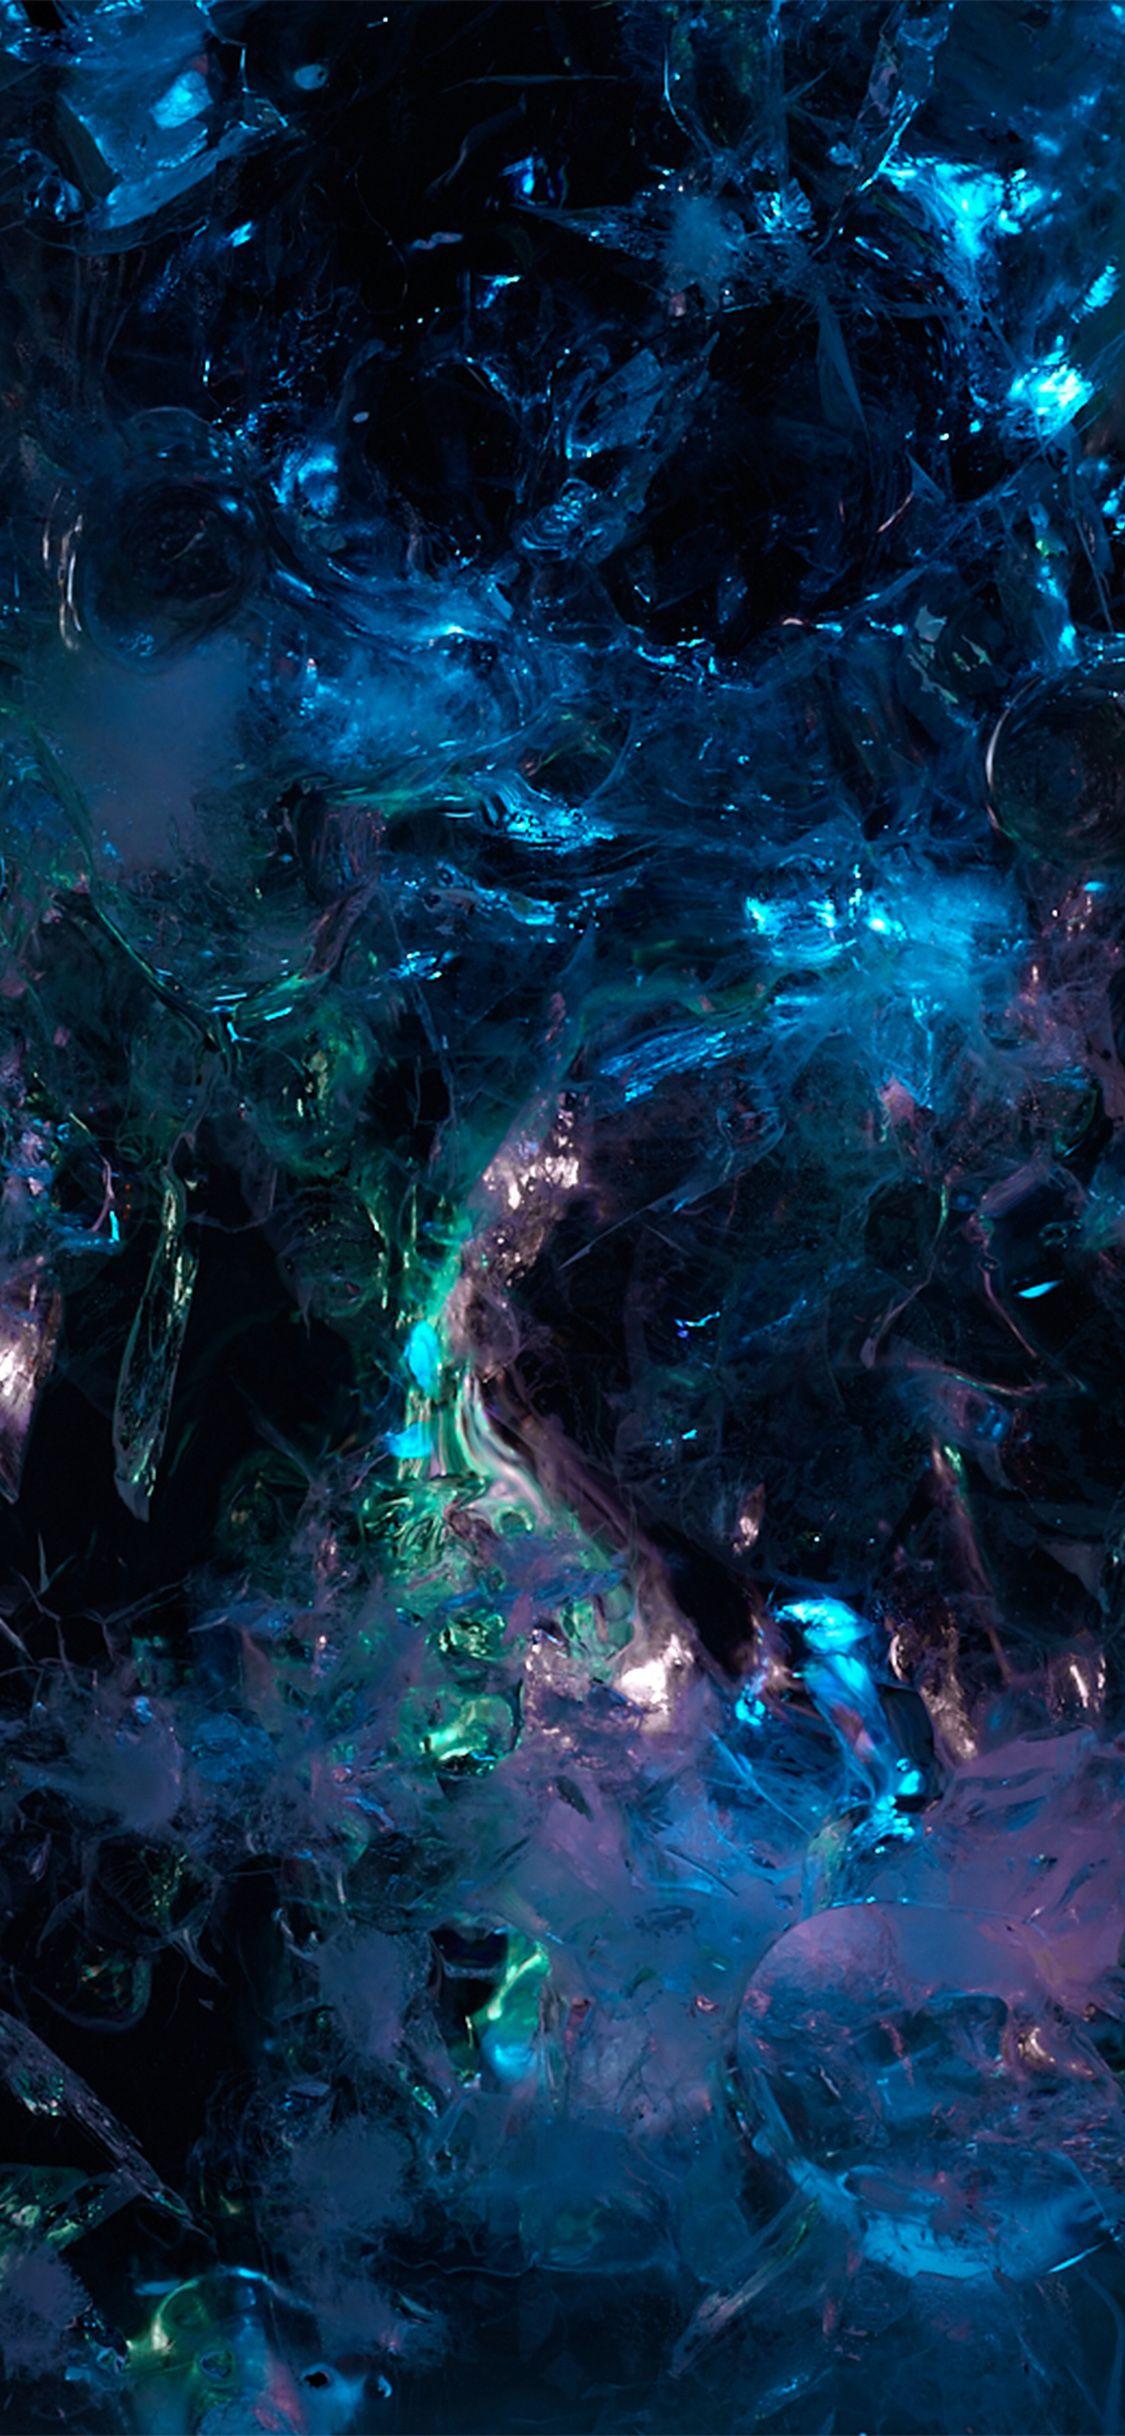 Iphonex Wallpaper Vx41 Digital Wallpaper Grunge Pattern Background Wallpaper Iphone Tumblr Grunge Digital Wallpaper Blue Wallpaper Iphone